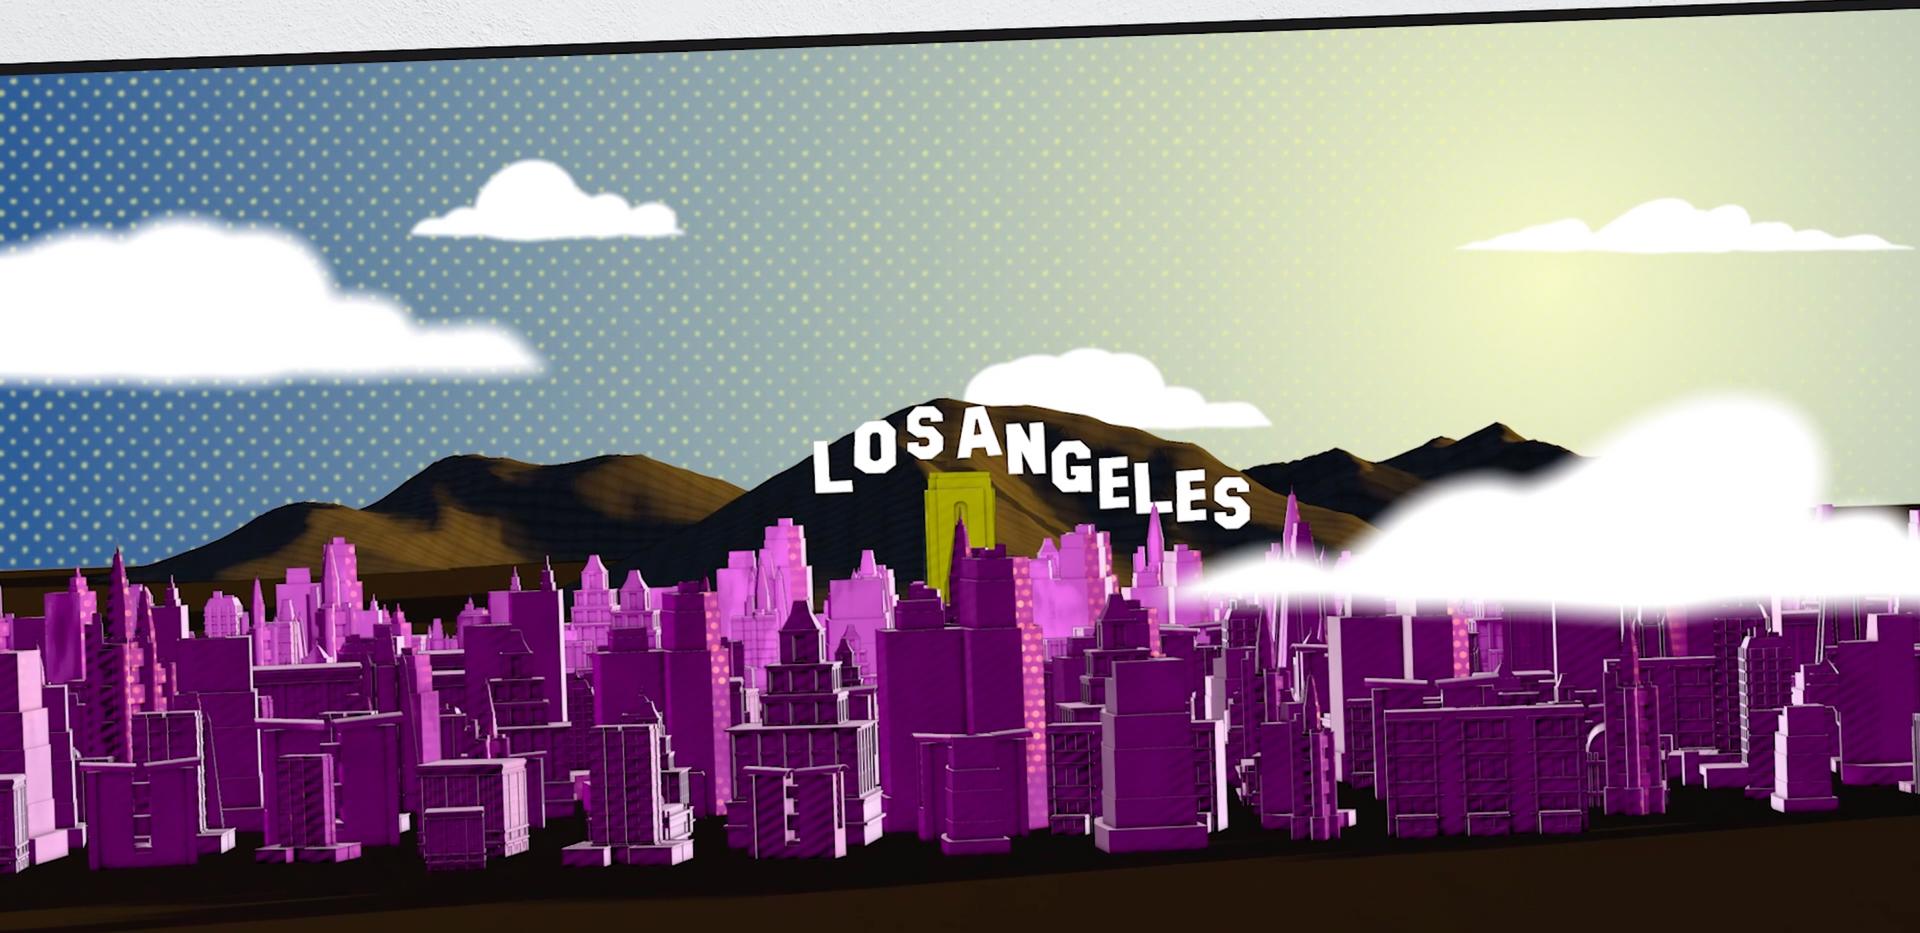 CALSOAP LEAGUE of Los Angeles: Heroic Beginnings